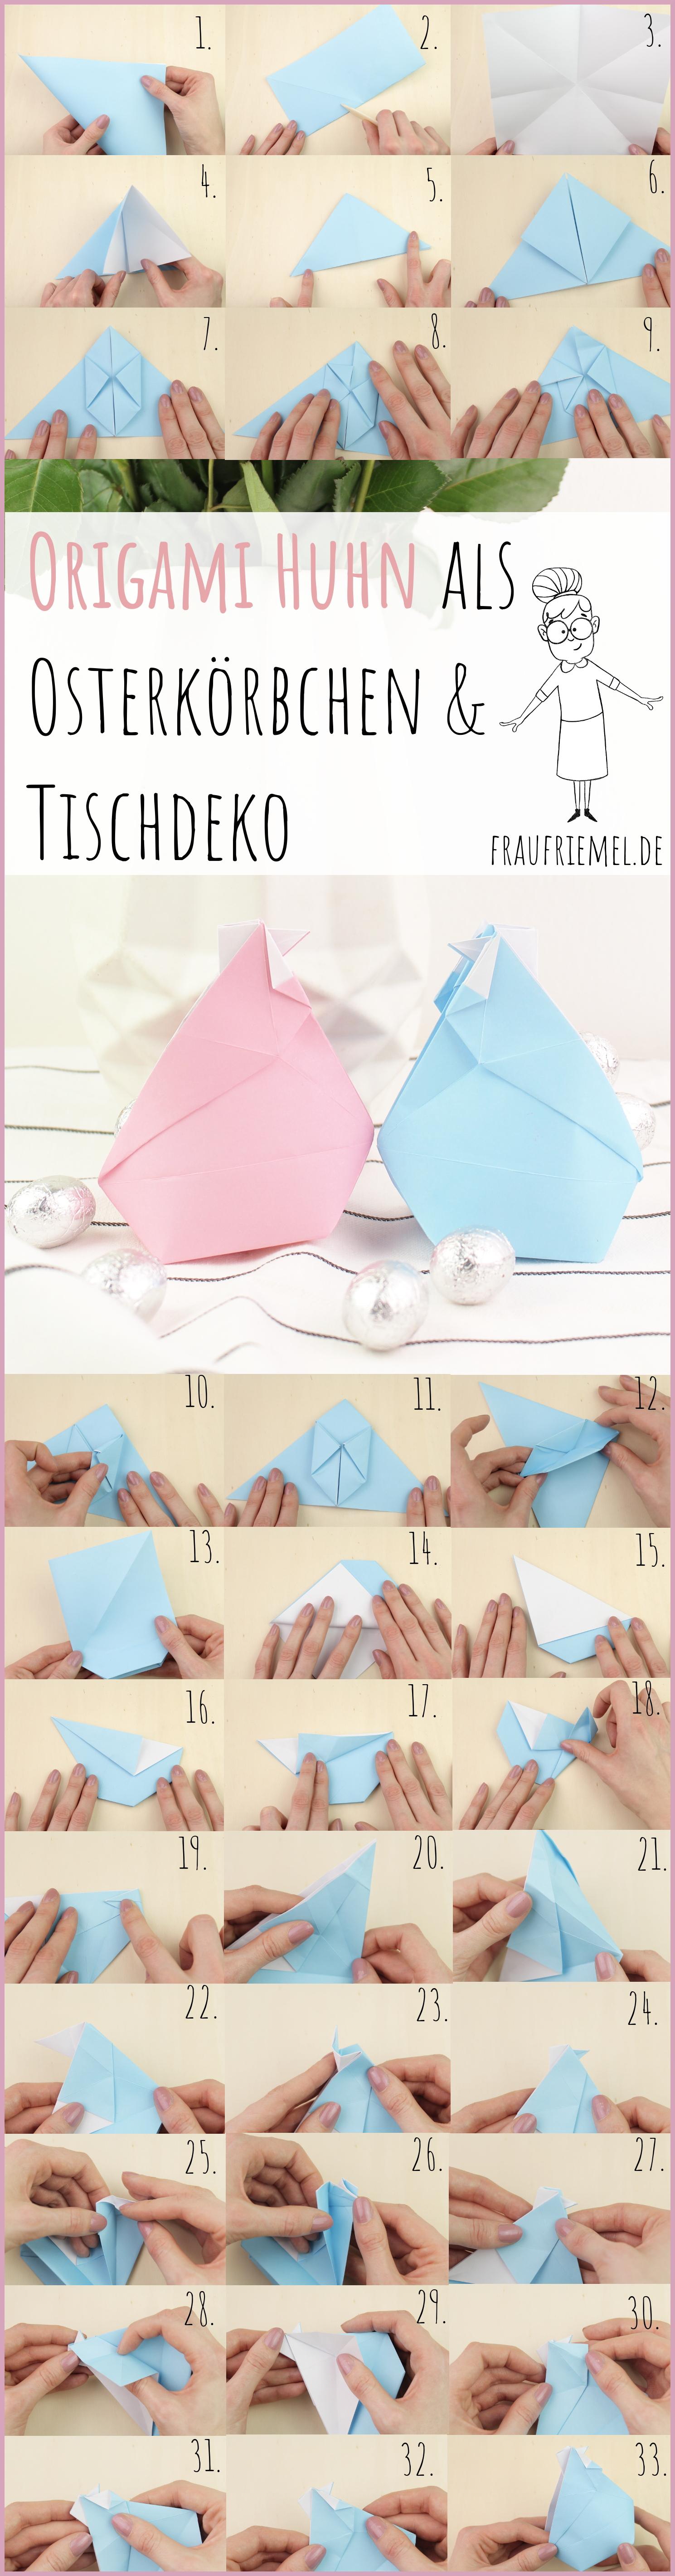 Gesamtanleitung Origami Huhn